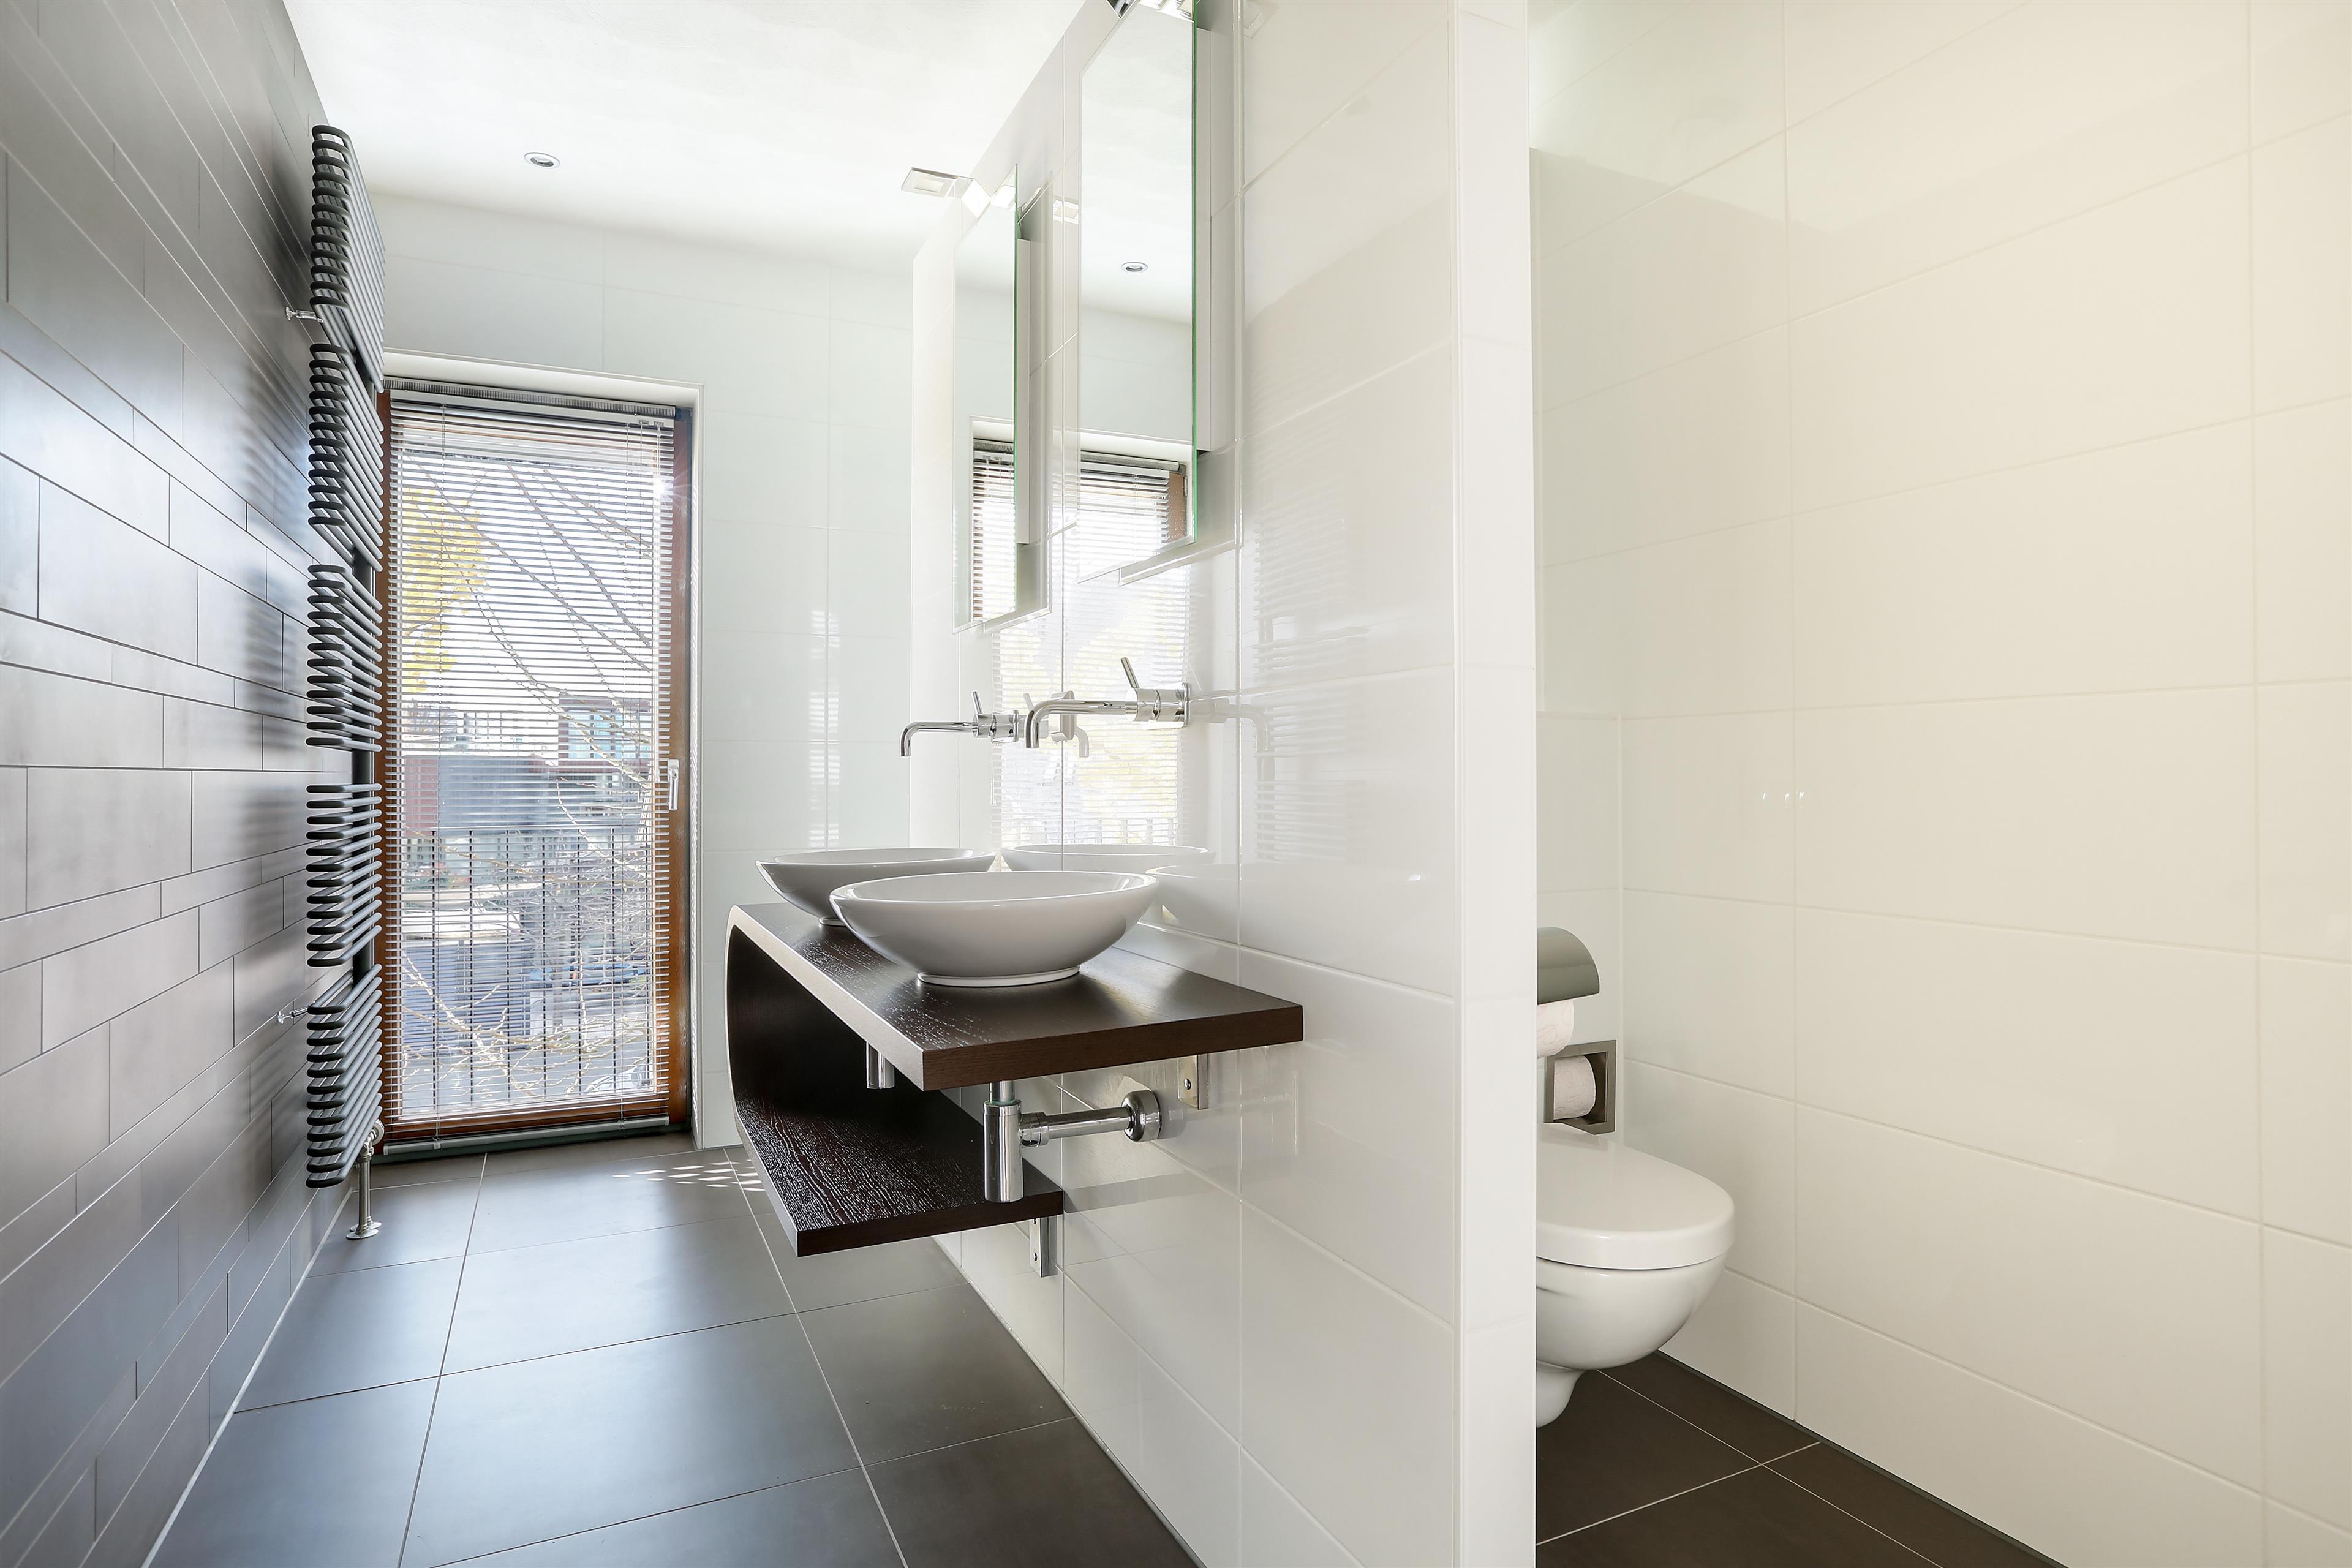 Badkamer Almere Buiten : Te koop jamaicastraat almere hoekstra en van eck